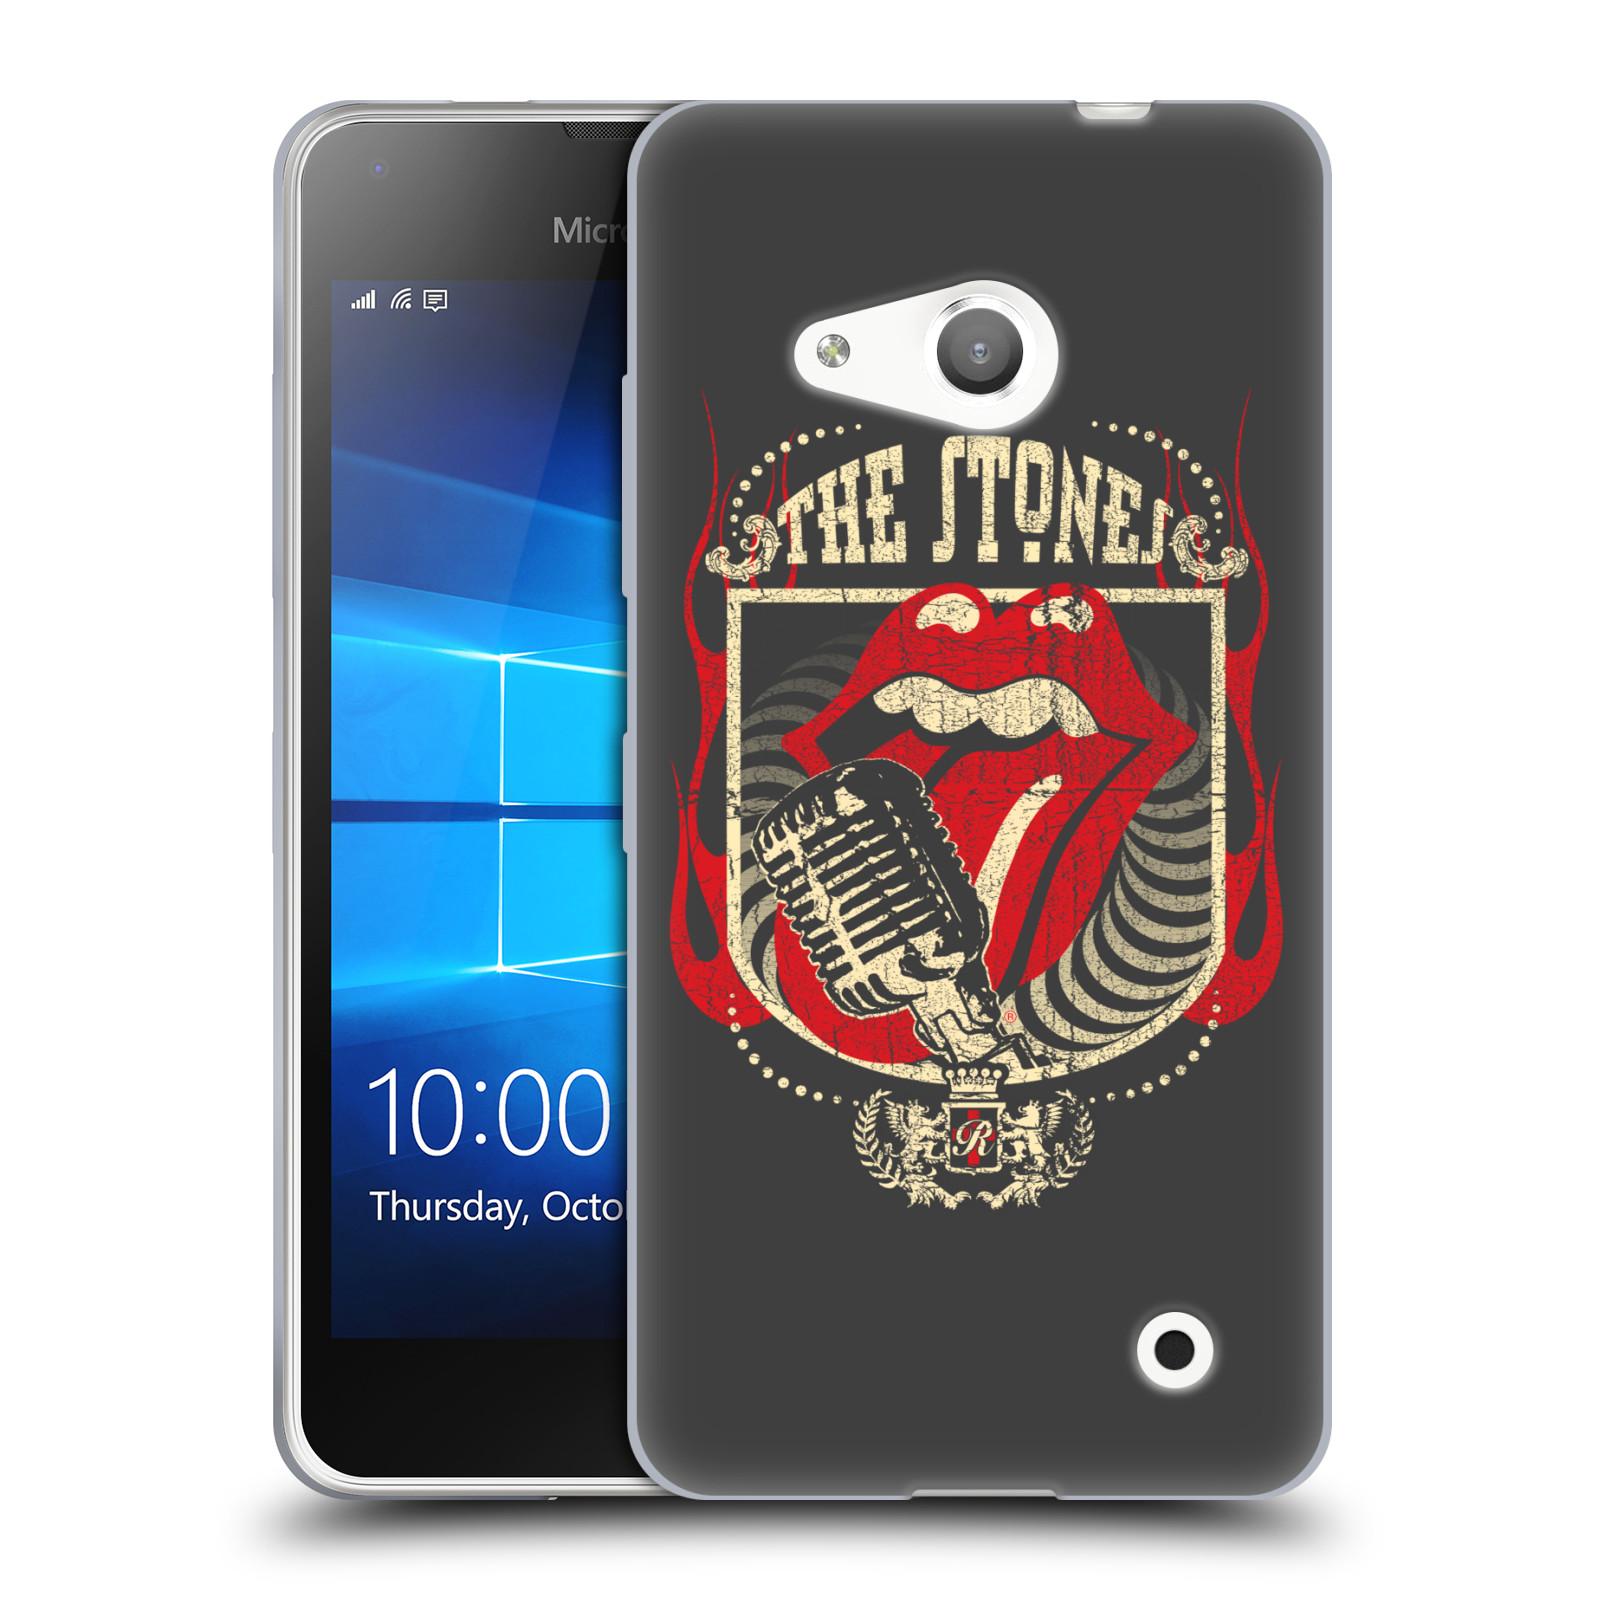 Silikonové pouzdro na mobil Microsoft Lumia 550 HEAD CASE The Rolling Stones - Mikrák (Silikonový kryt či obal The Rolling Stones Official na mobilní telefon Microsoft Lumia 550)